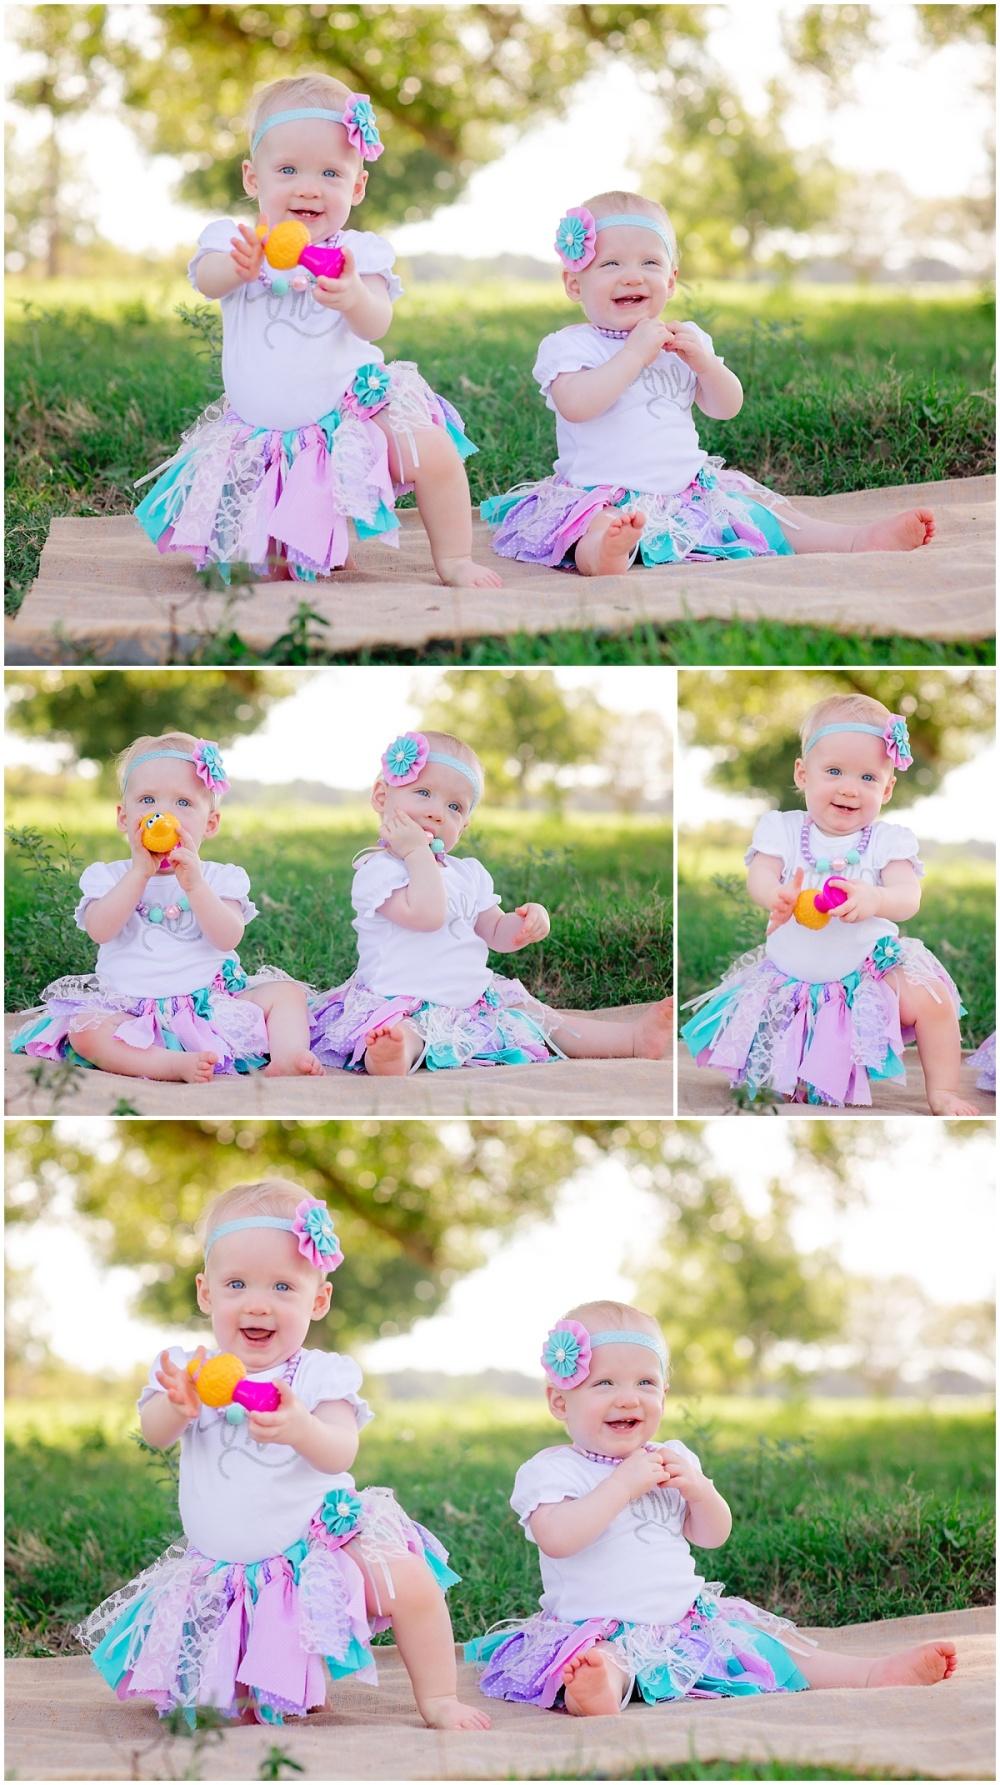 Family-Children-Portraits-Cake-Smash-Photos-San-Antonio-Hill-Country-Texas-Carly-Barton-Photography_0009.jpg